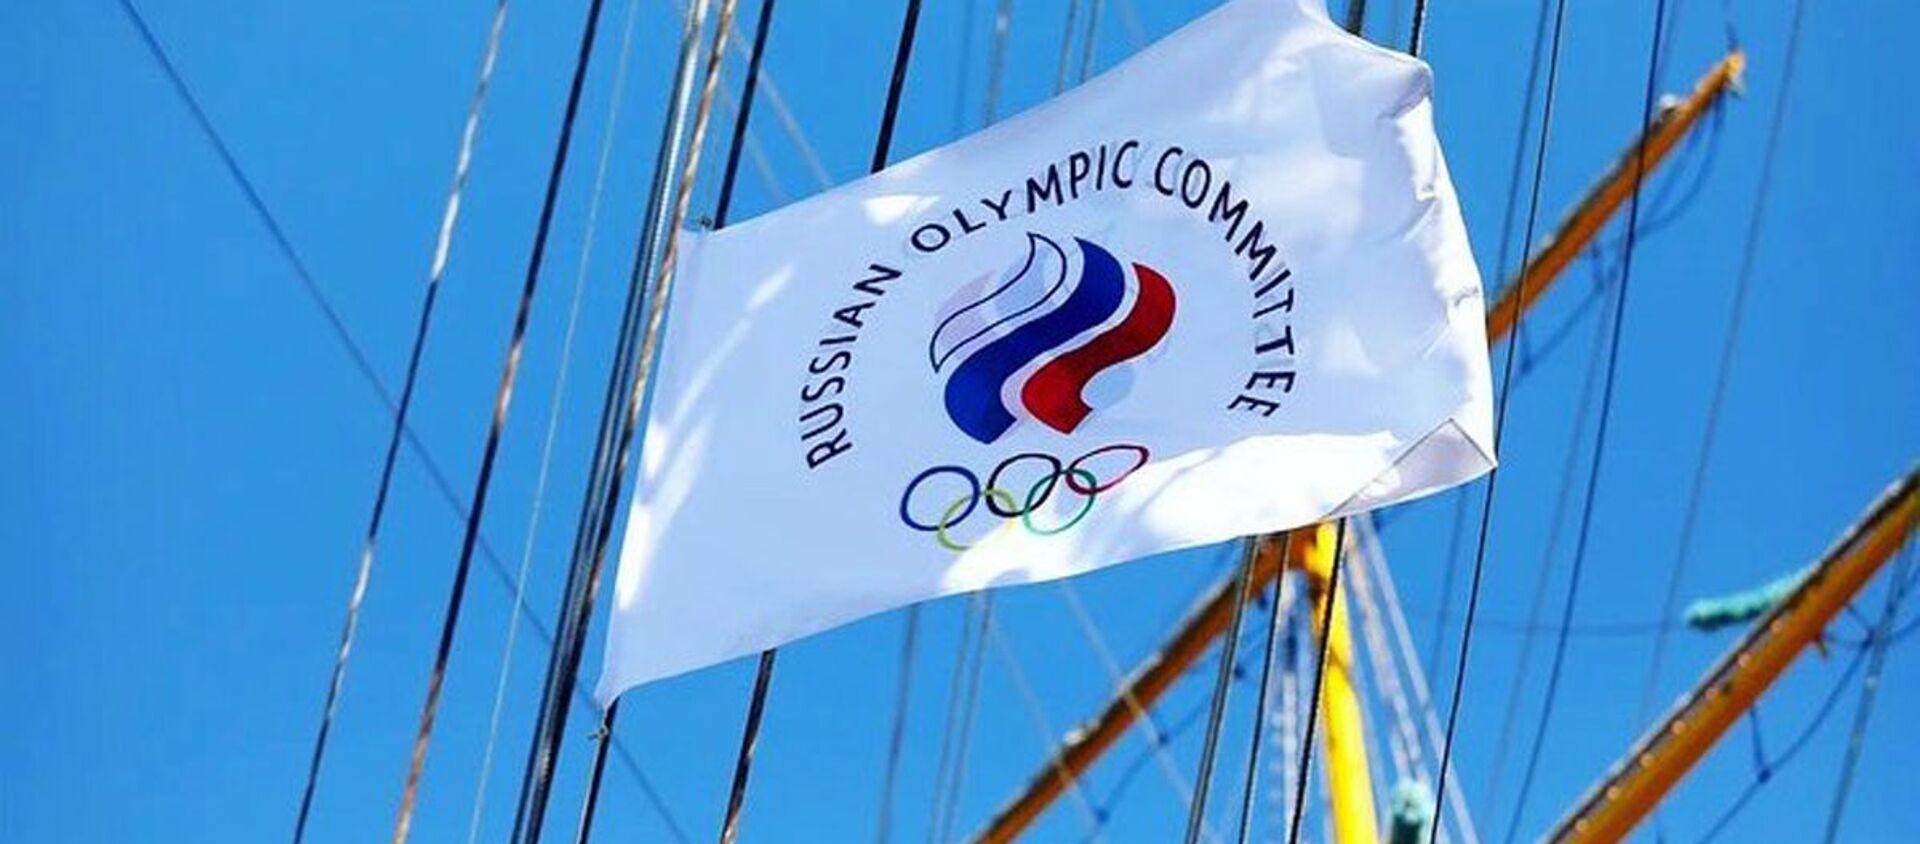 Cờ của Ủy ban Olympic Nga. - Sputnik Việt Nam, 1920, 19.02.2021